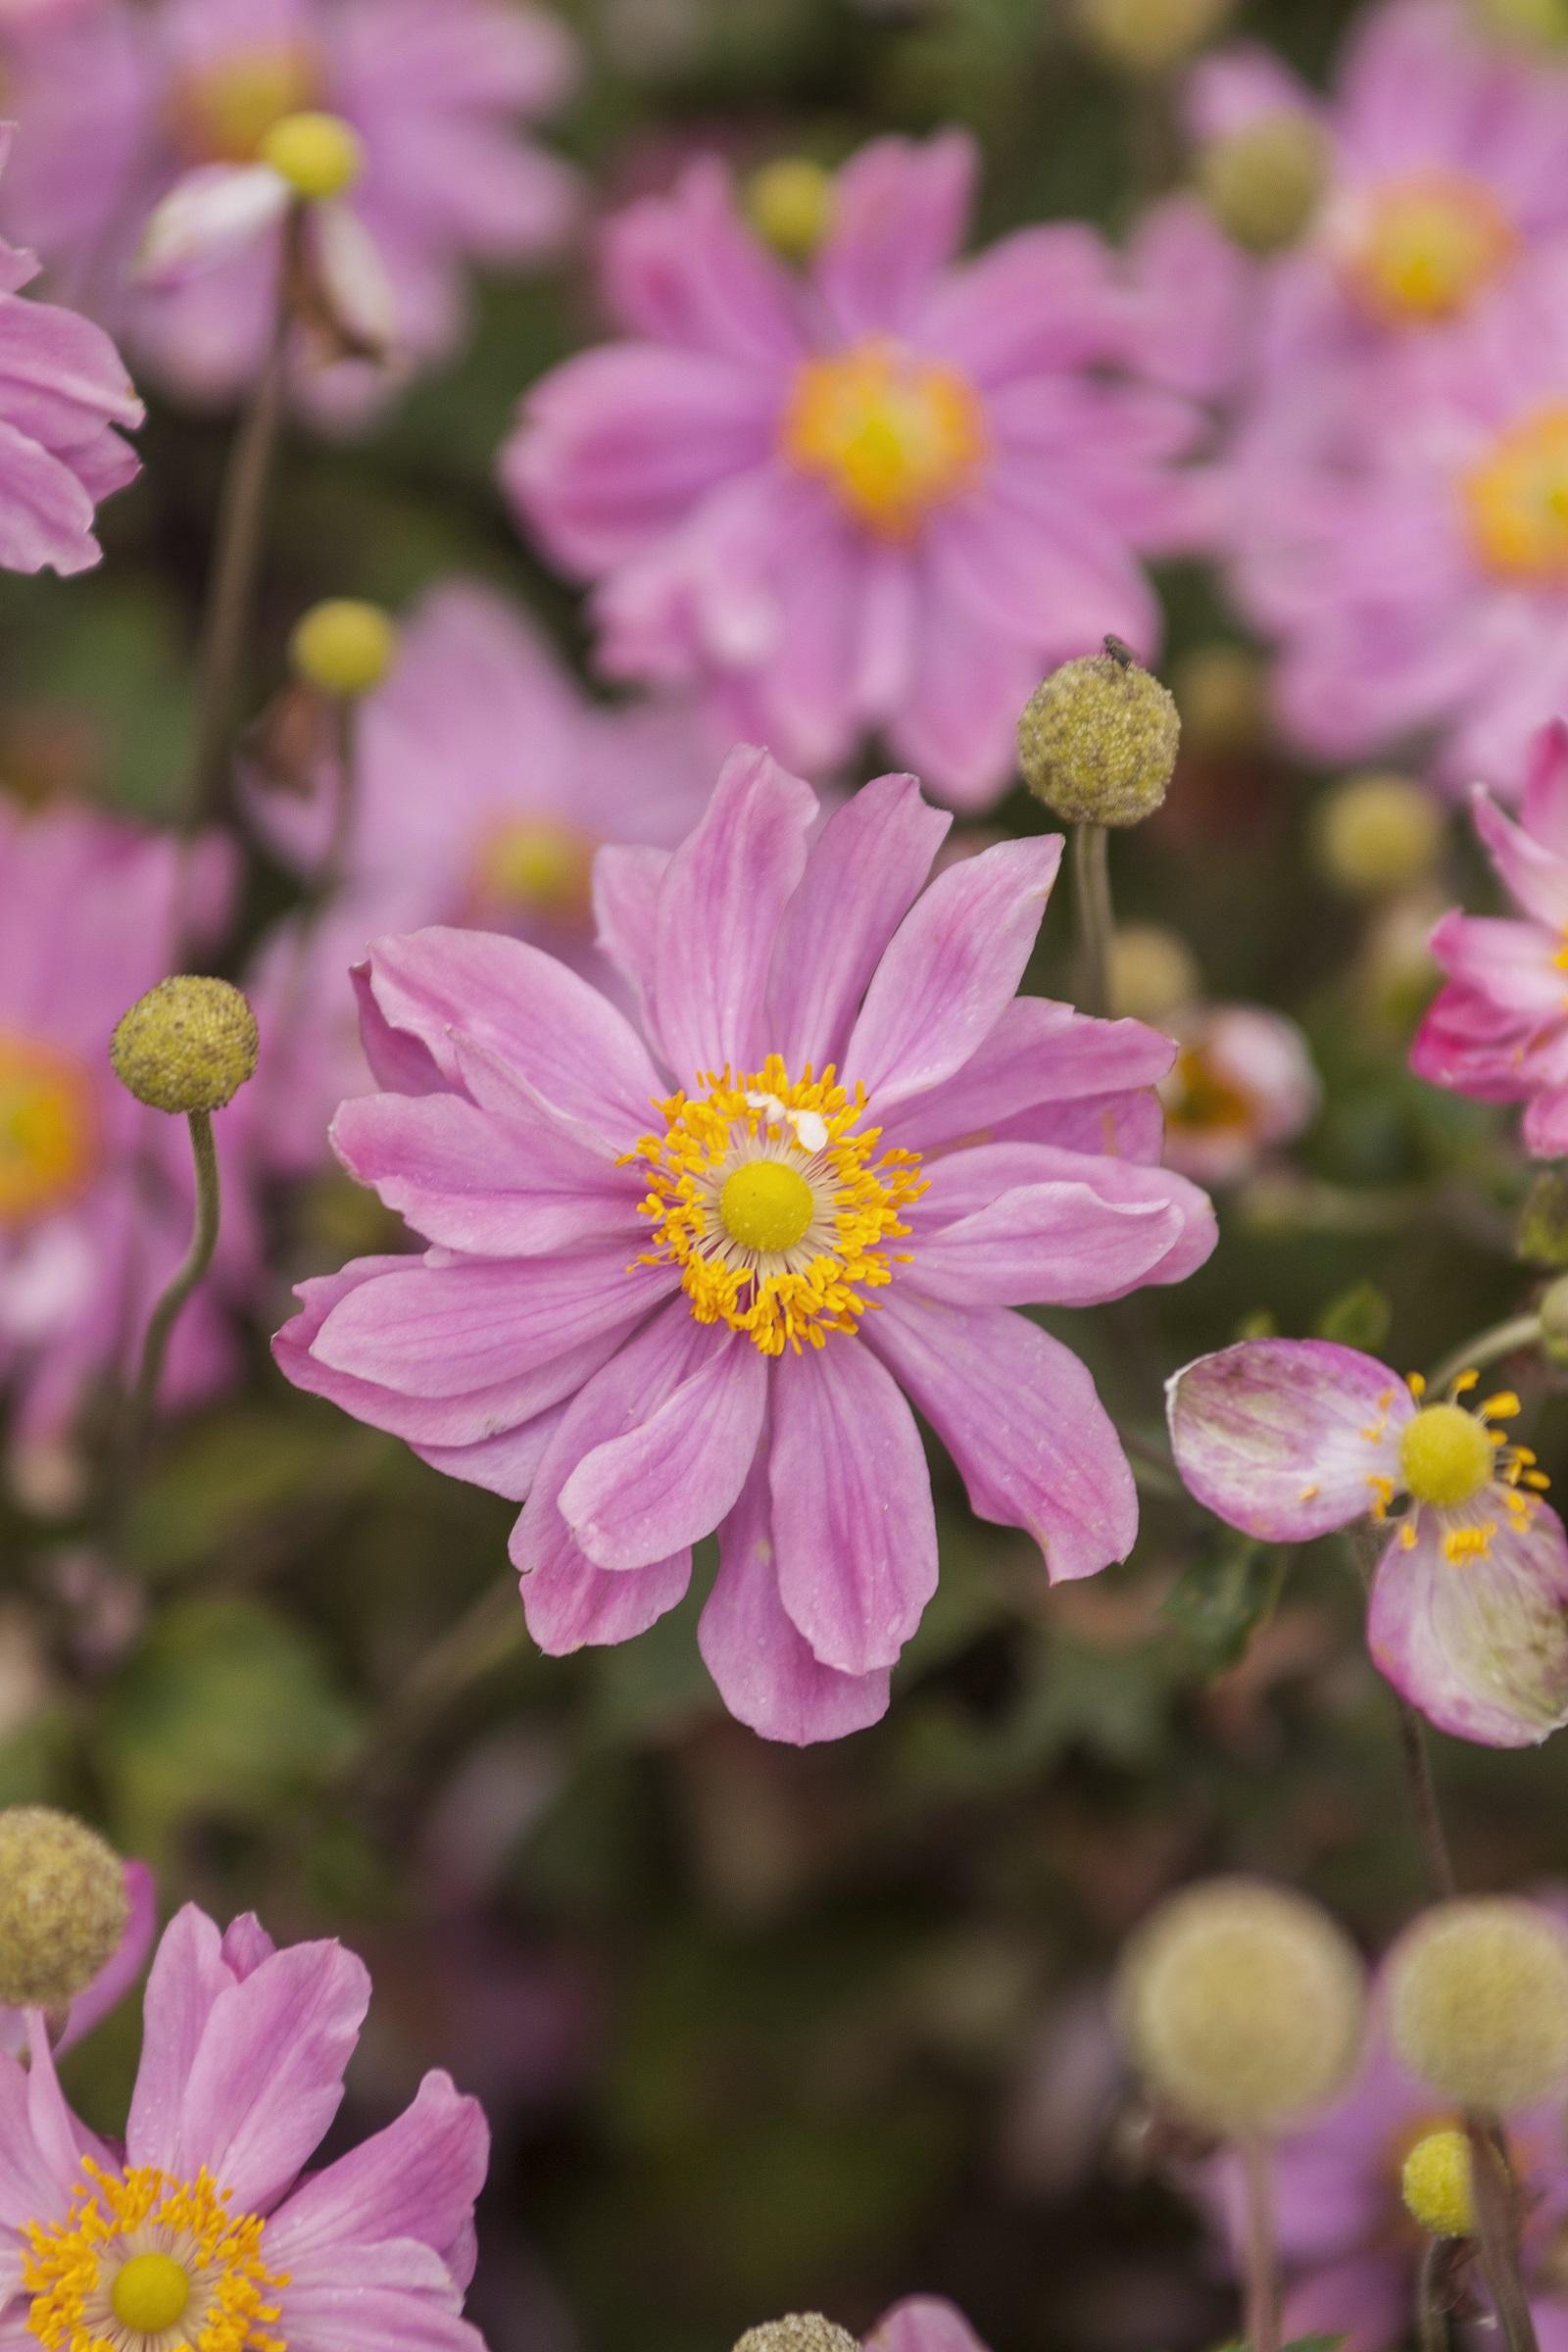 Herbst-Anemone (Anemone japonica) 'Pretty Lady Emily' T19, rosa - winterhart